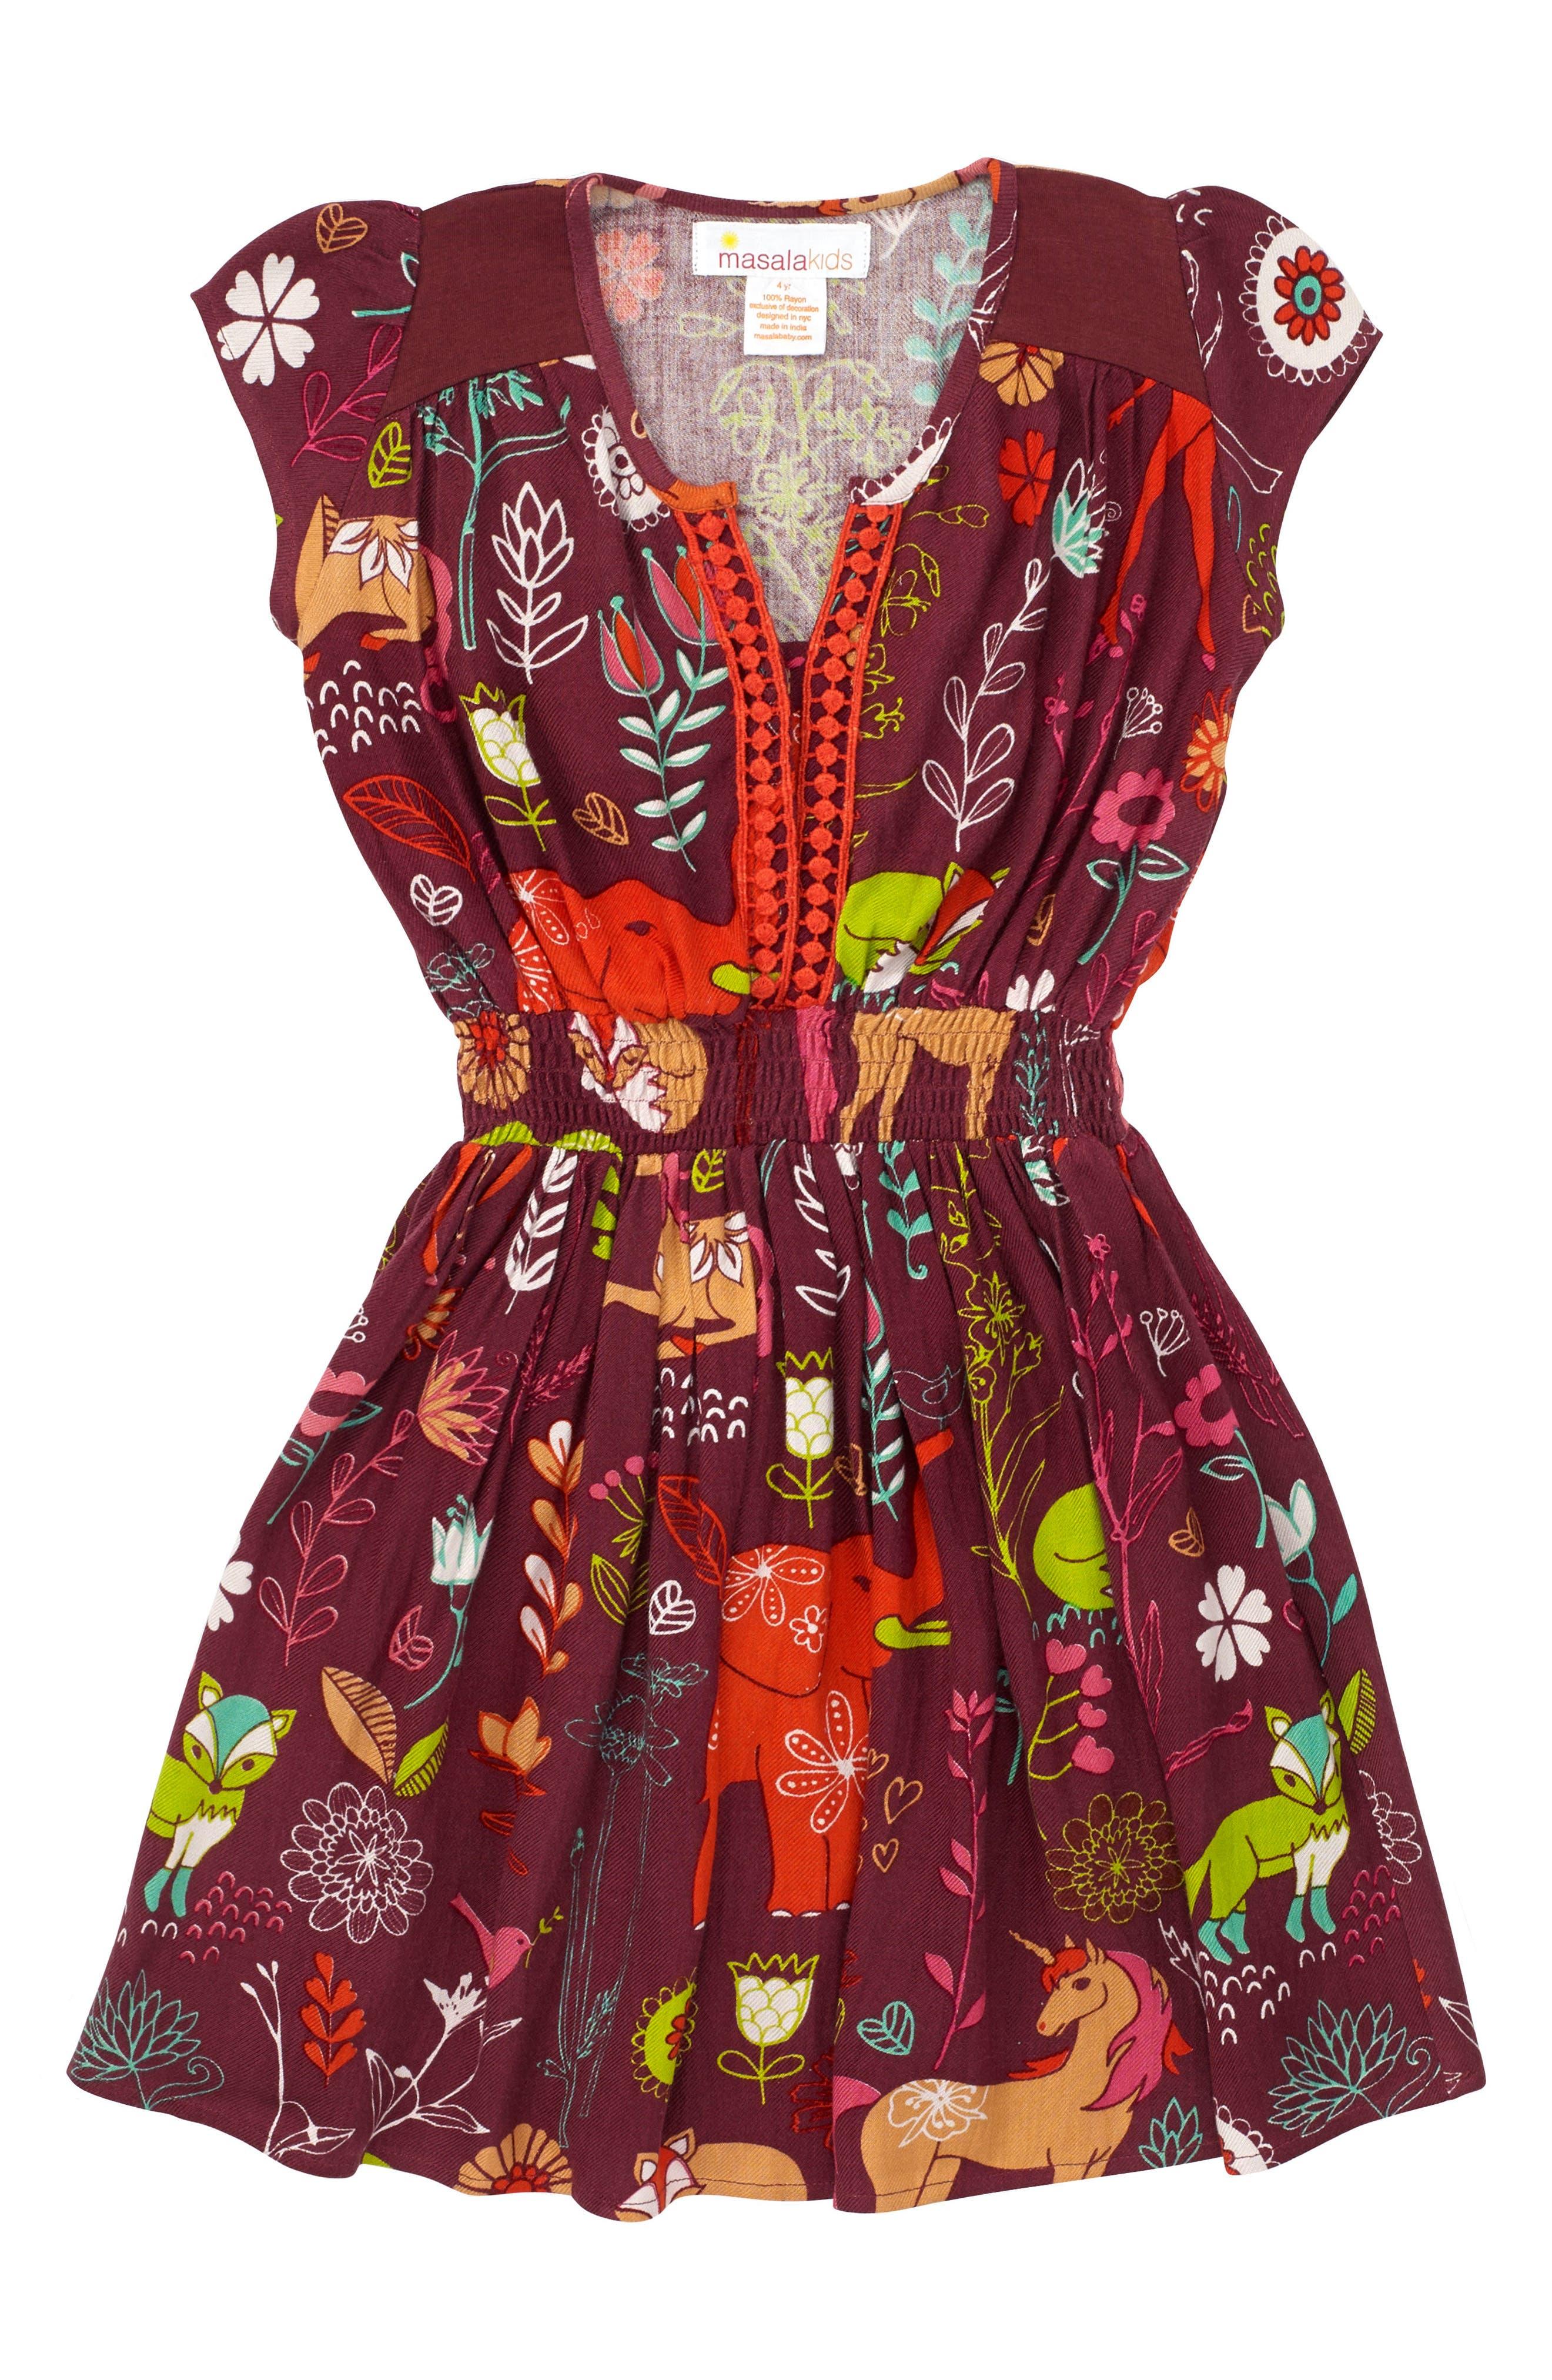 Main Image - Masalababy Magical Forest Dress (Toddler Girls, Little Girls & Big Girls)